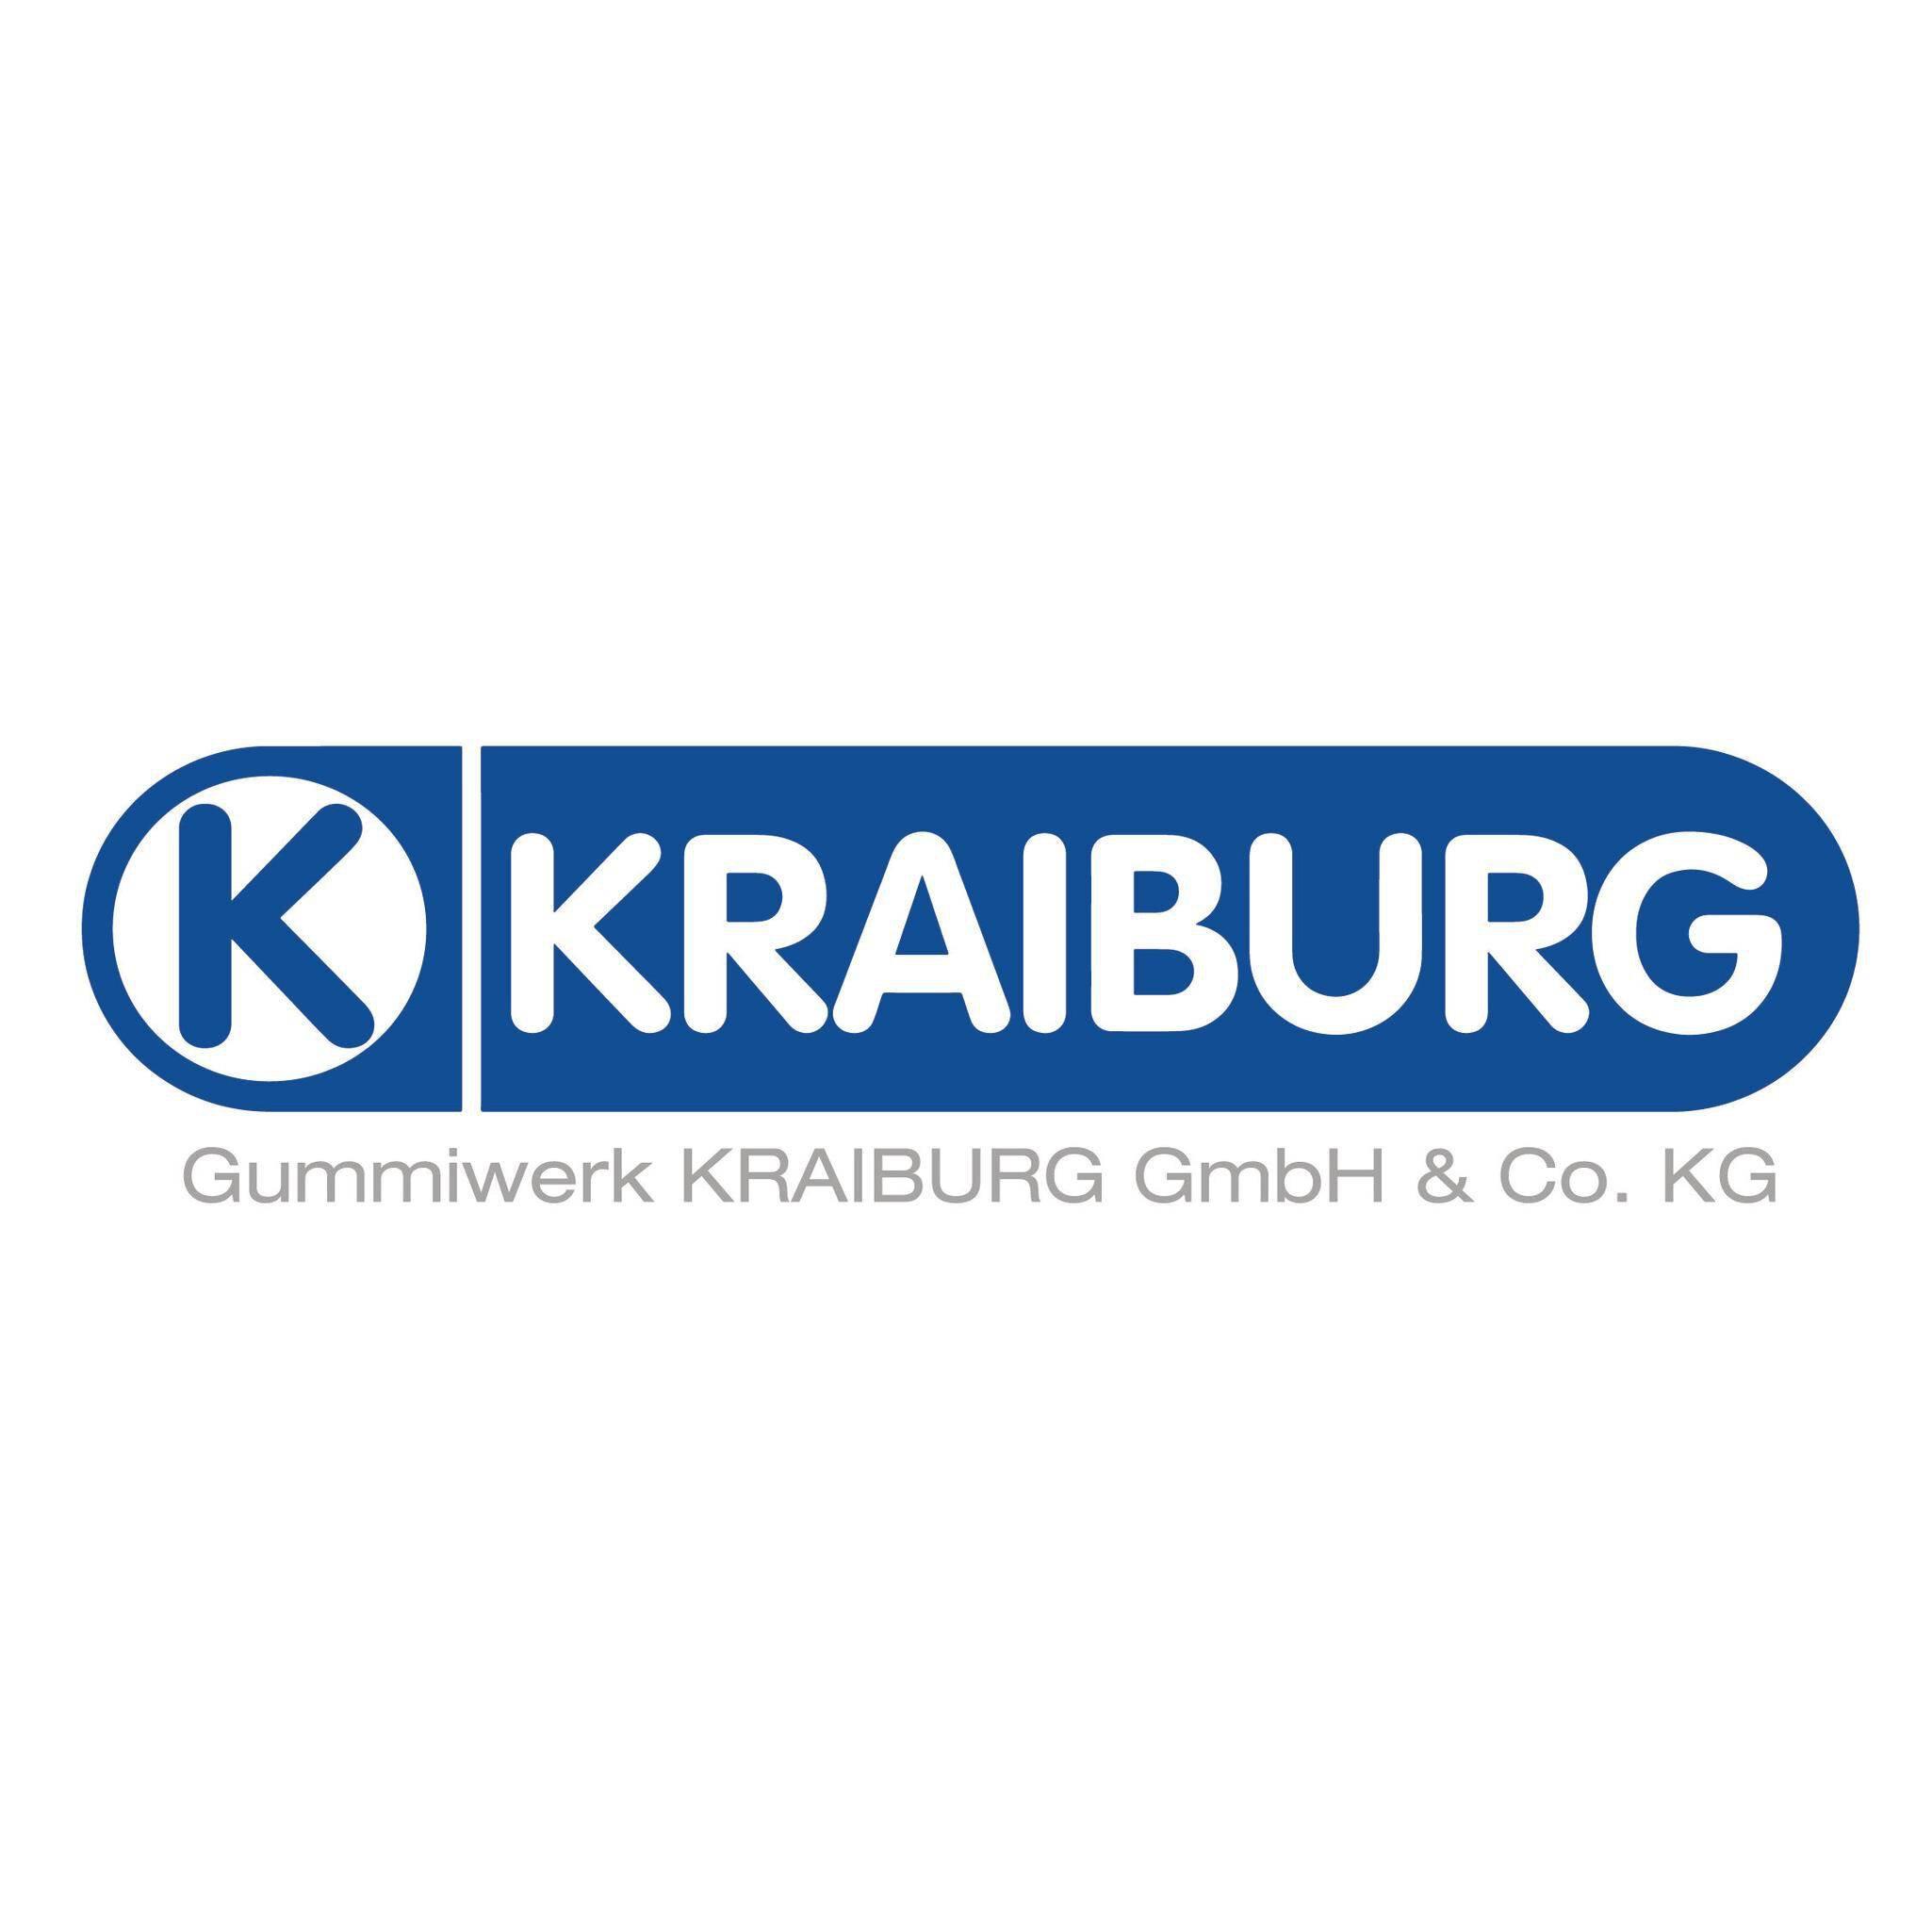 Company logo of Gummiwerk KRAIBURG GmbH & Co. KG